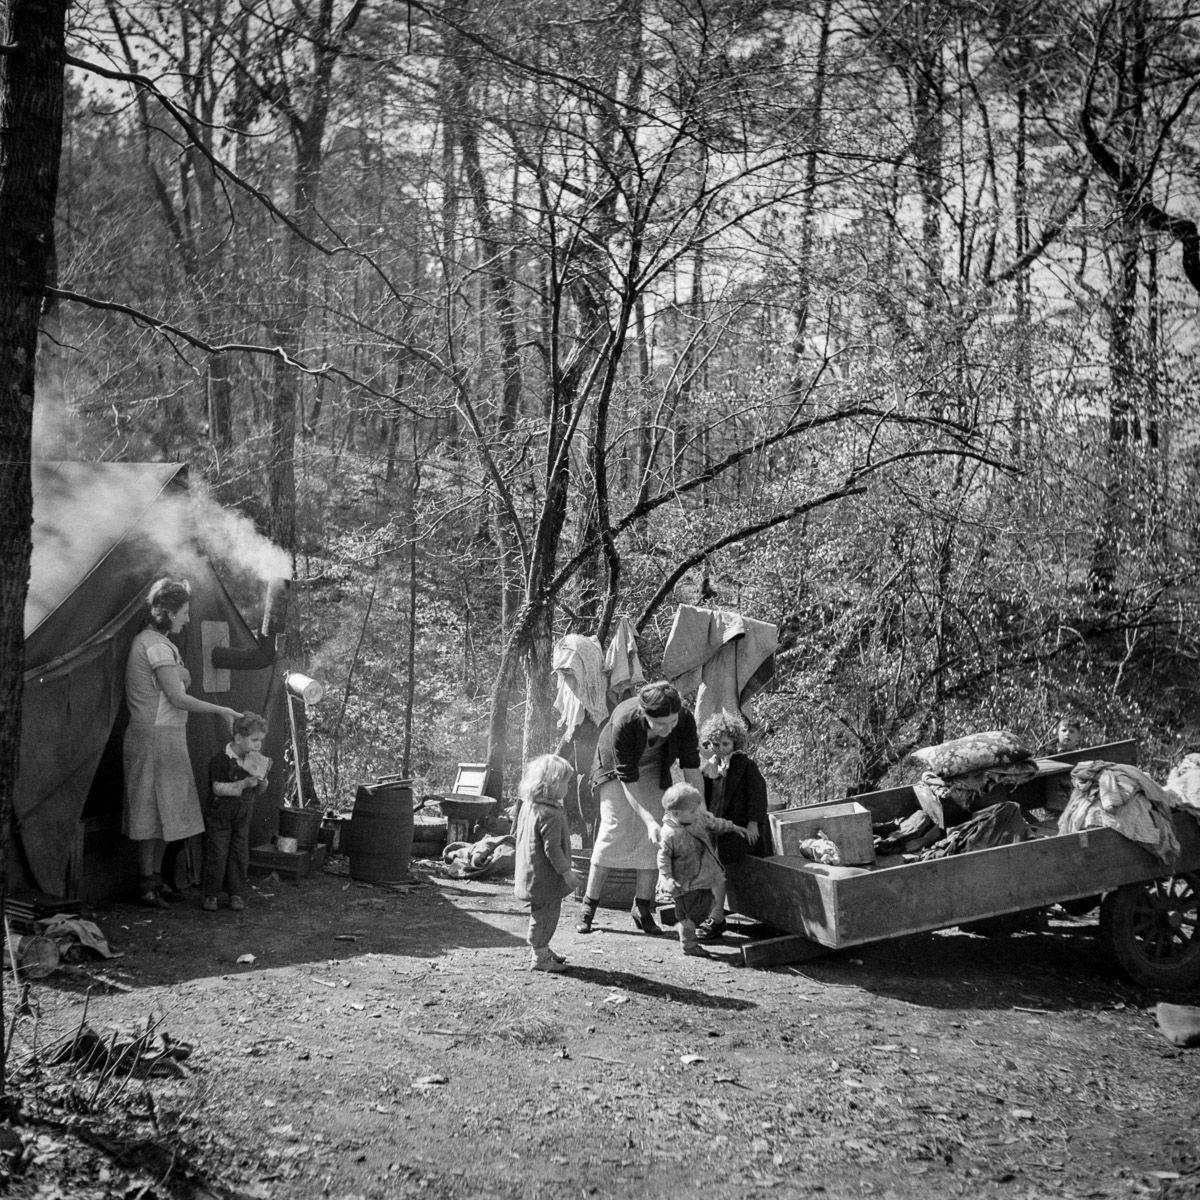 A migrant encampment in Birmingham, Alabama